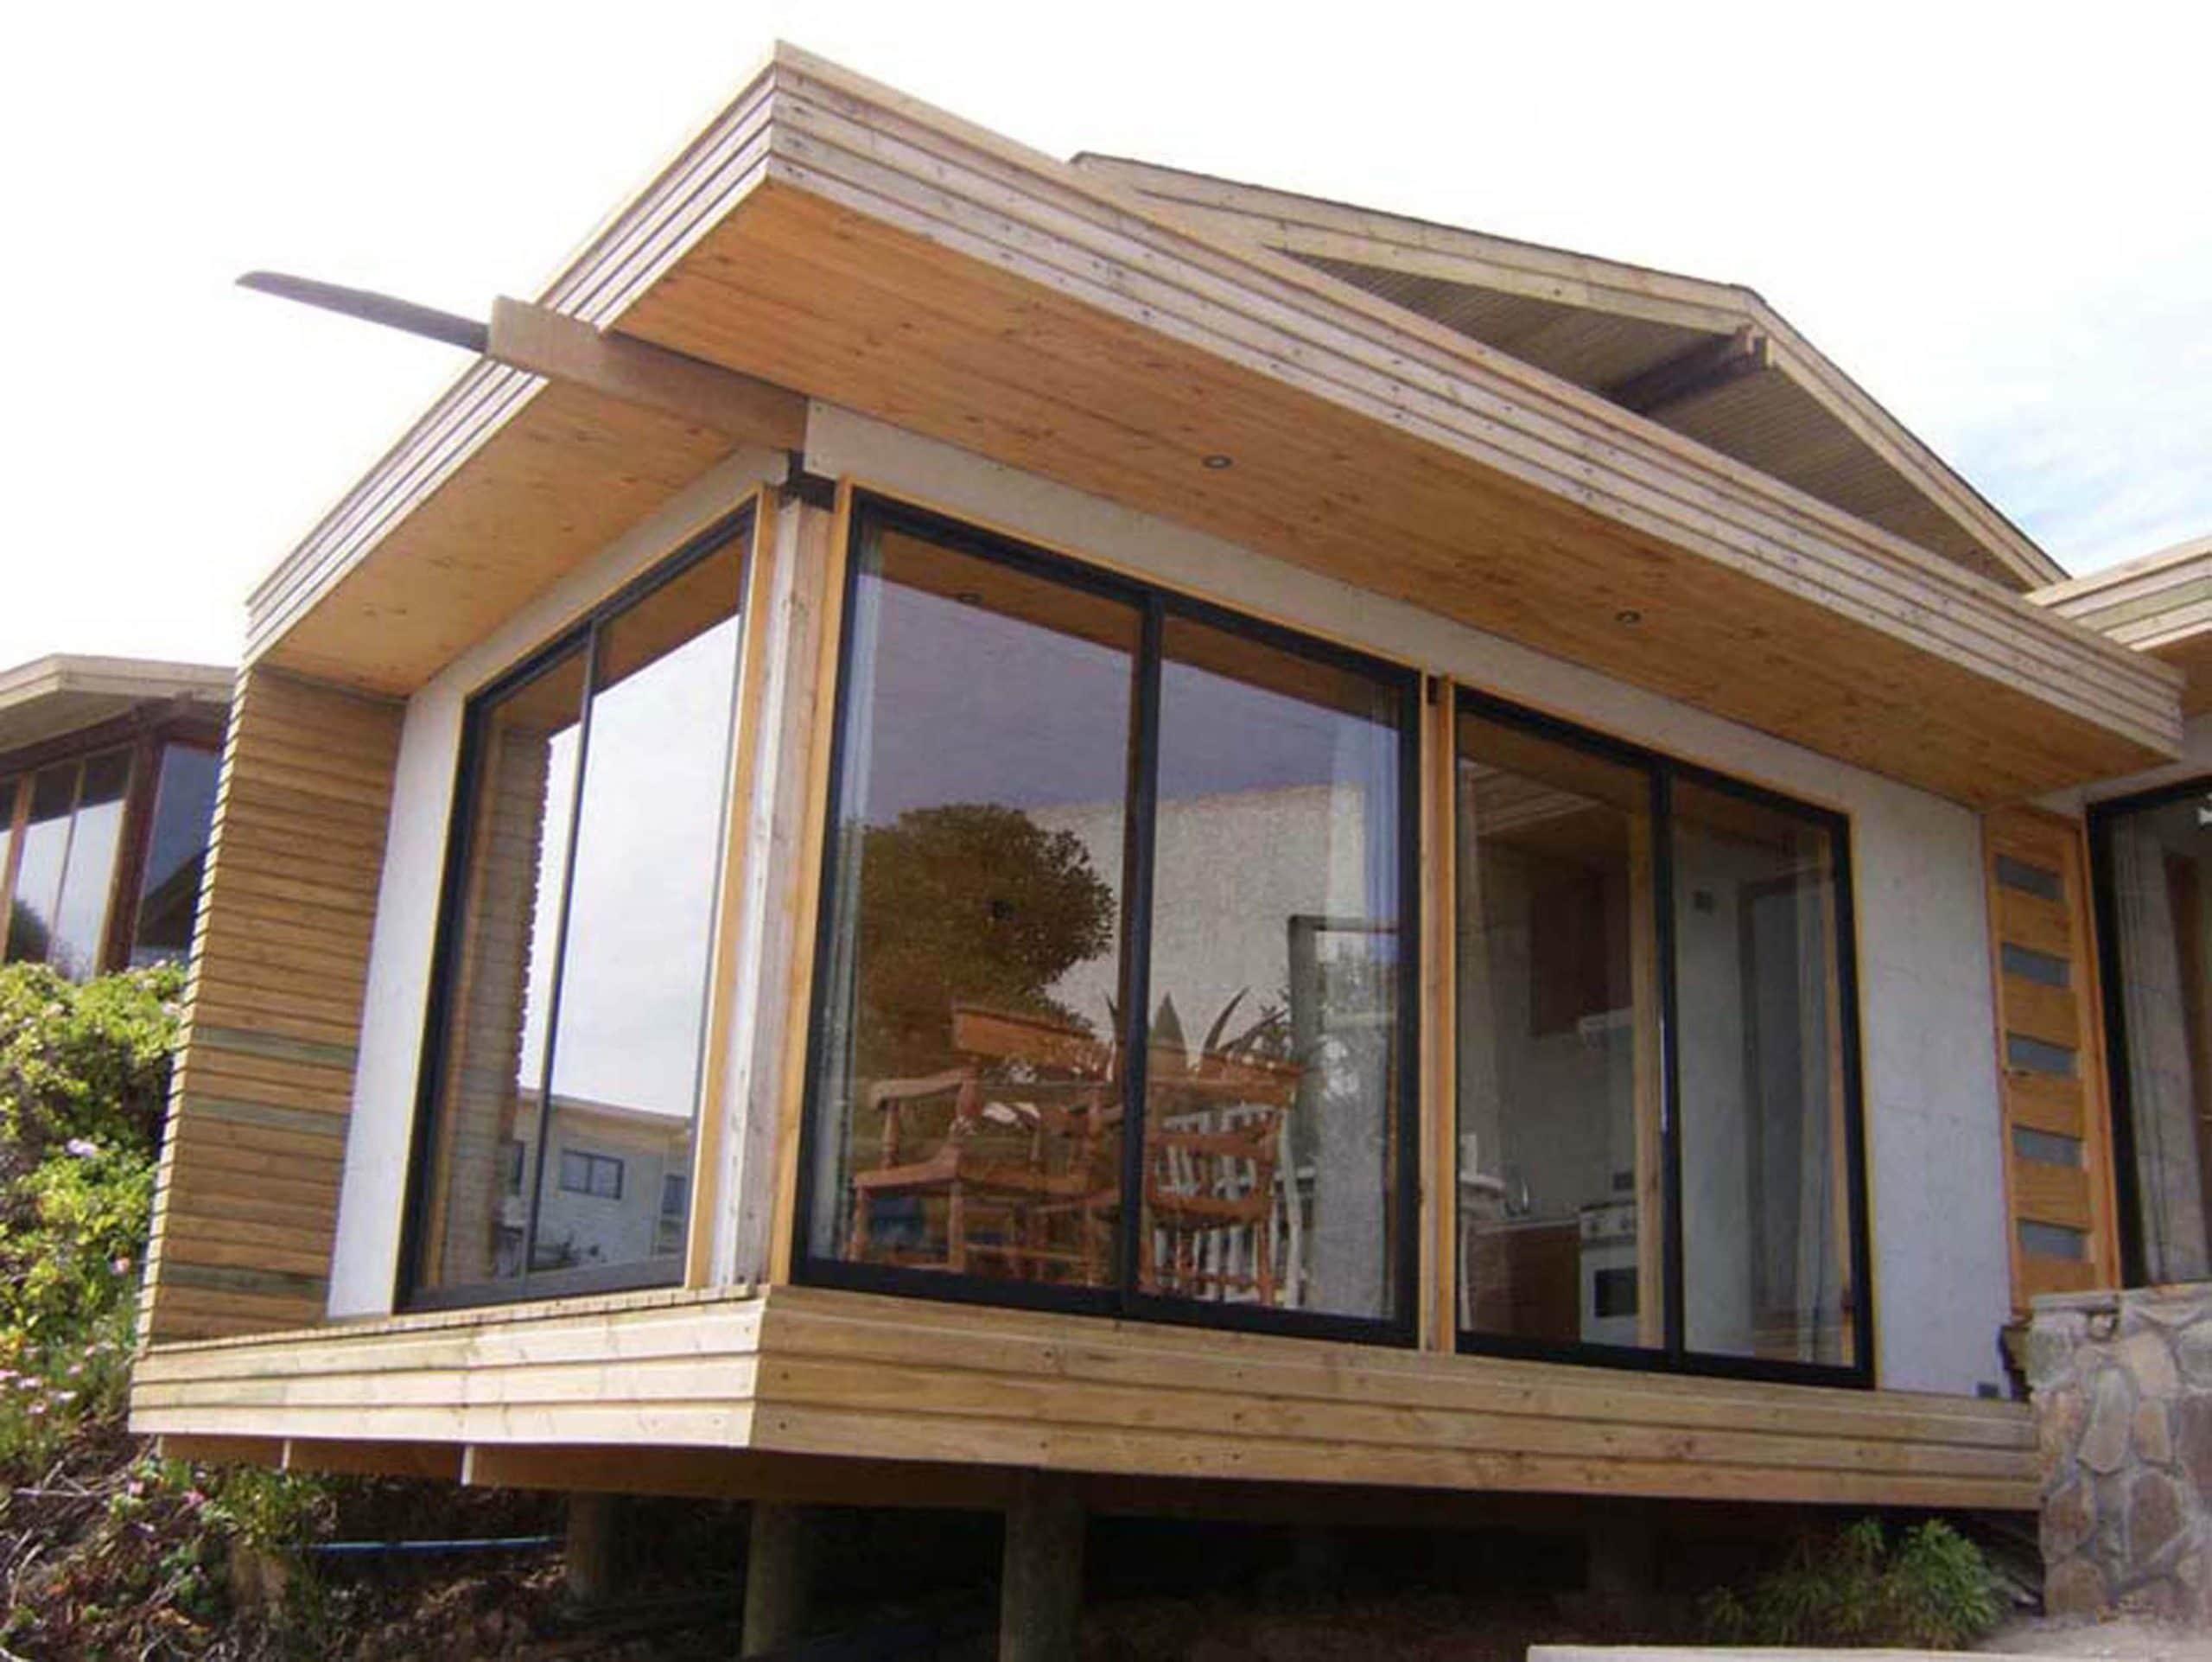 Casas prefabricadas en chile casas prefabricadas - Precios de casas prefabricadas ...